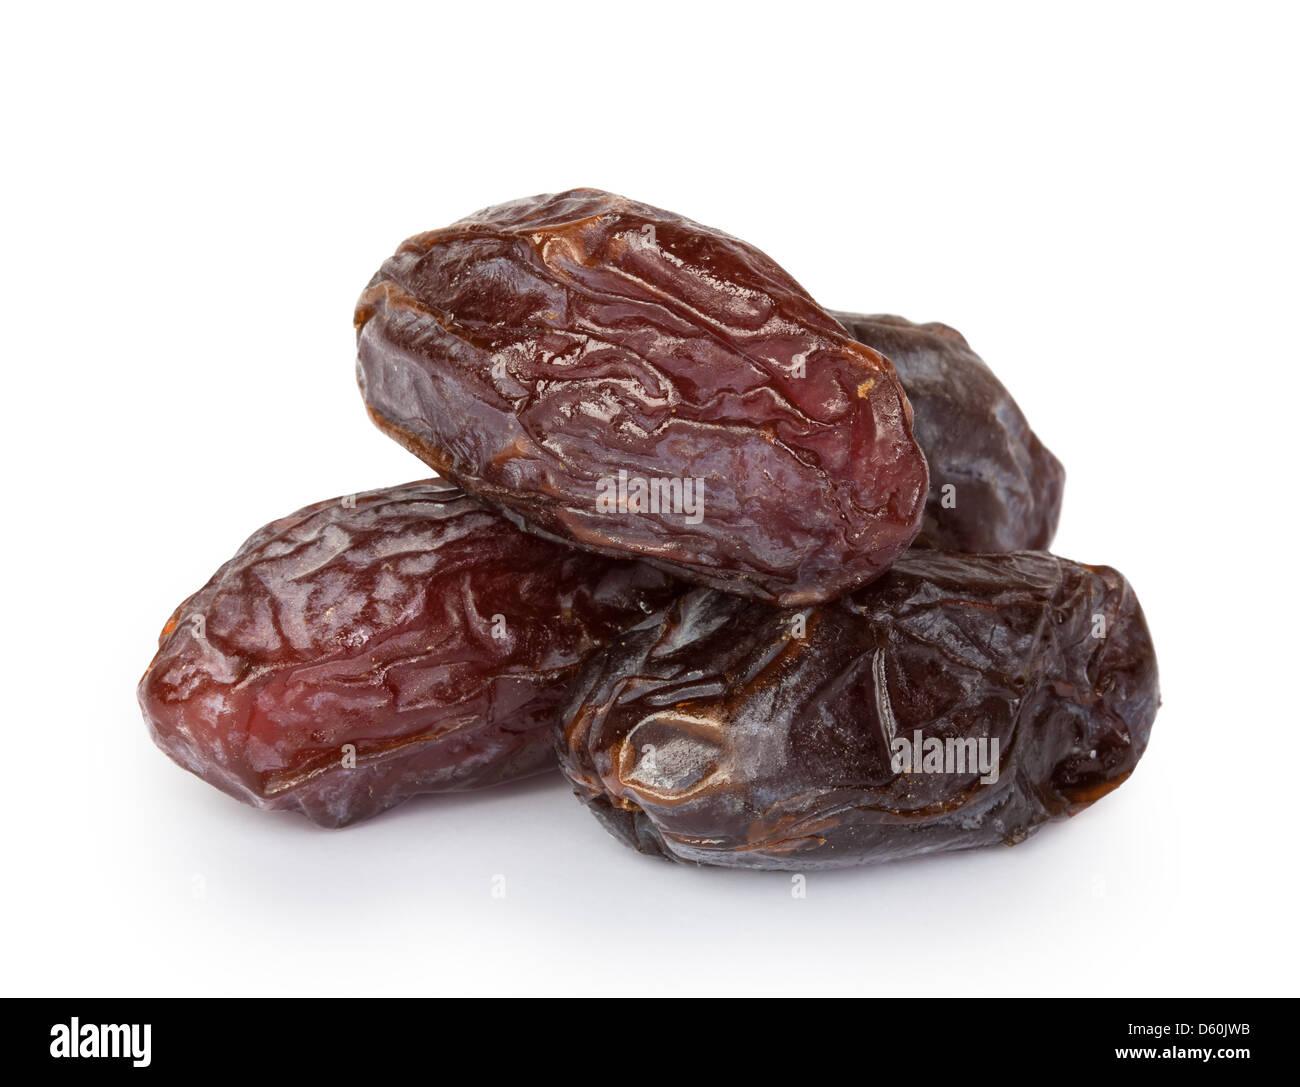 Dates - Stock Image